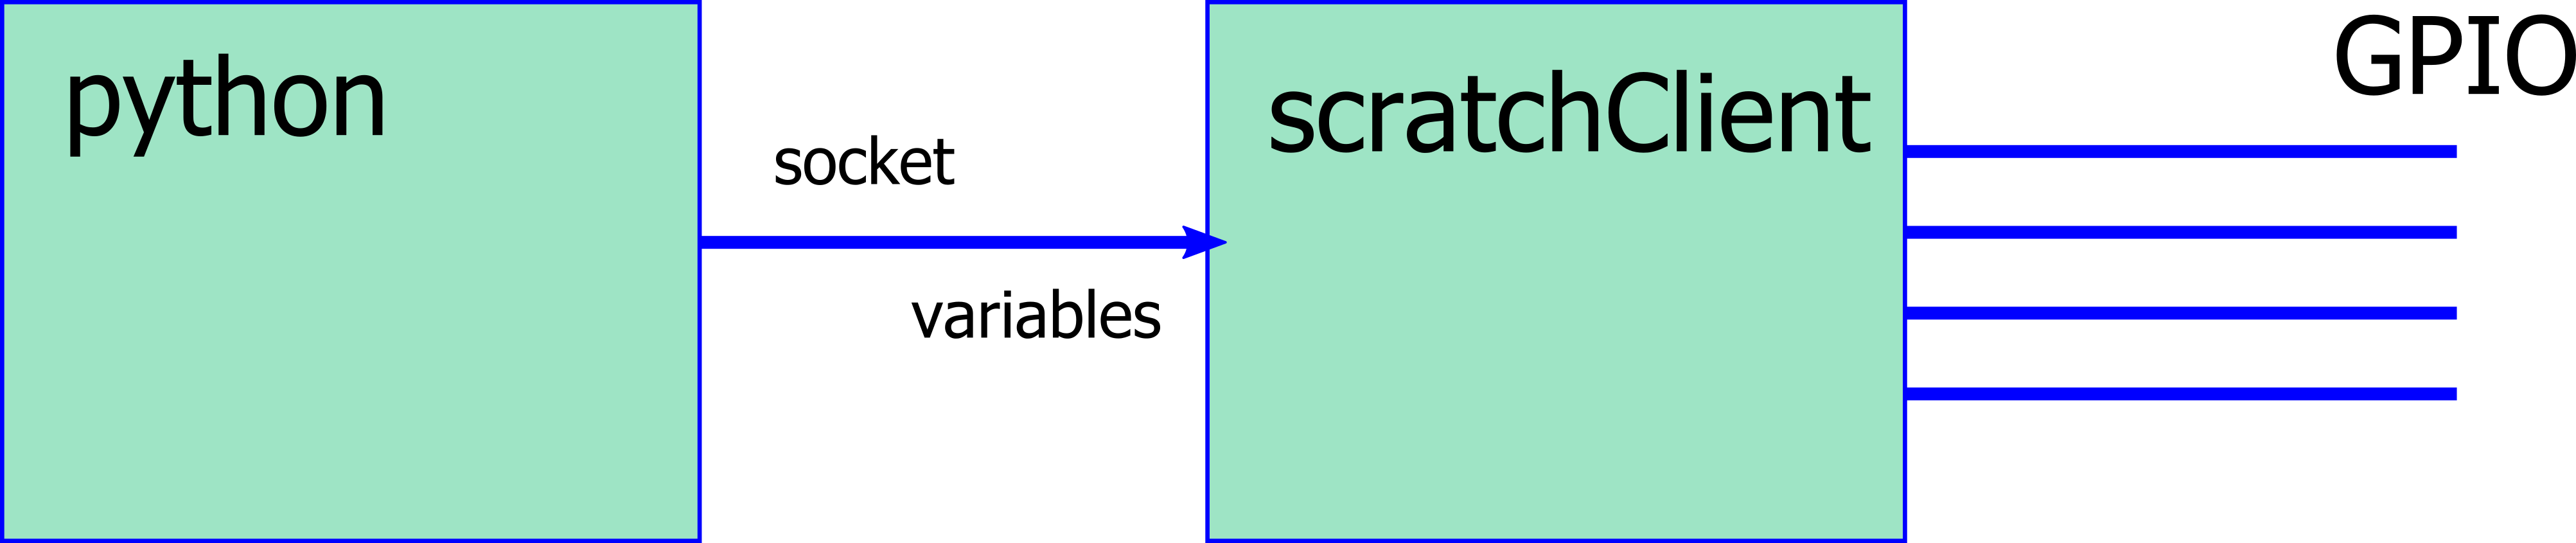 python_variables_scratchClient